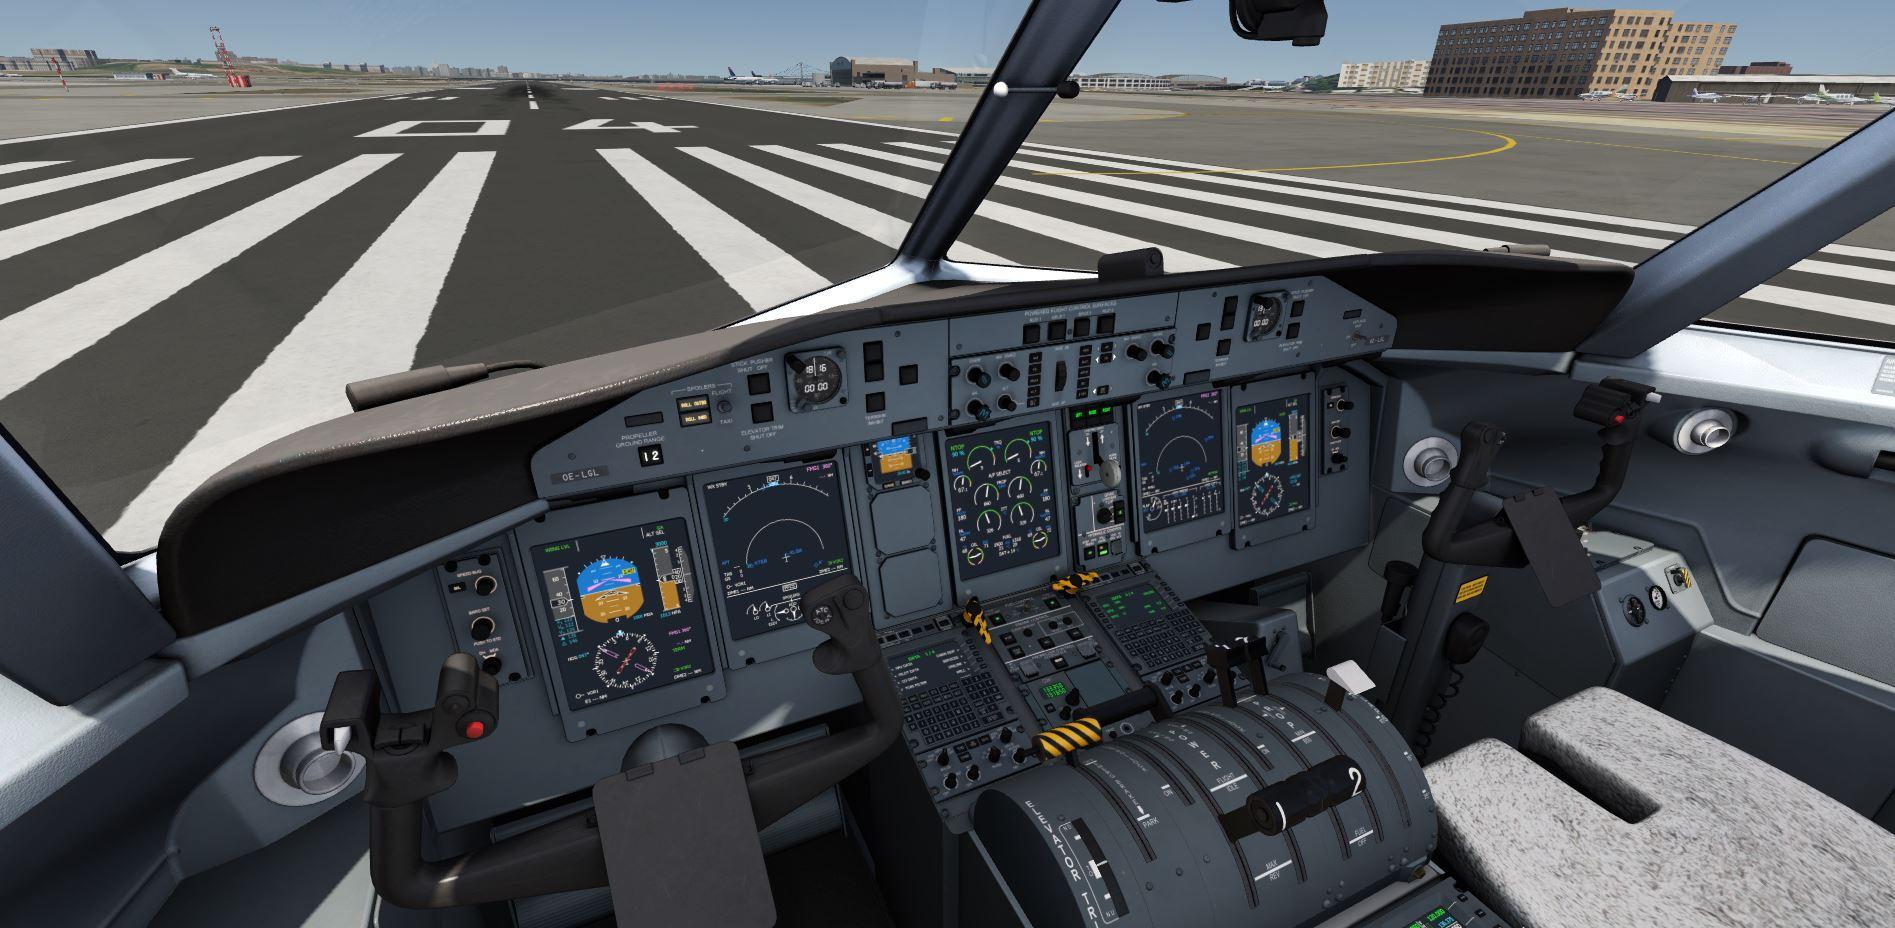 aircraft dash8 q400 flight deck rh aerofly com HP NC4200 User Manual